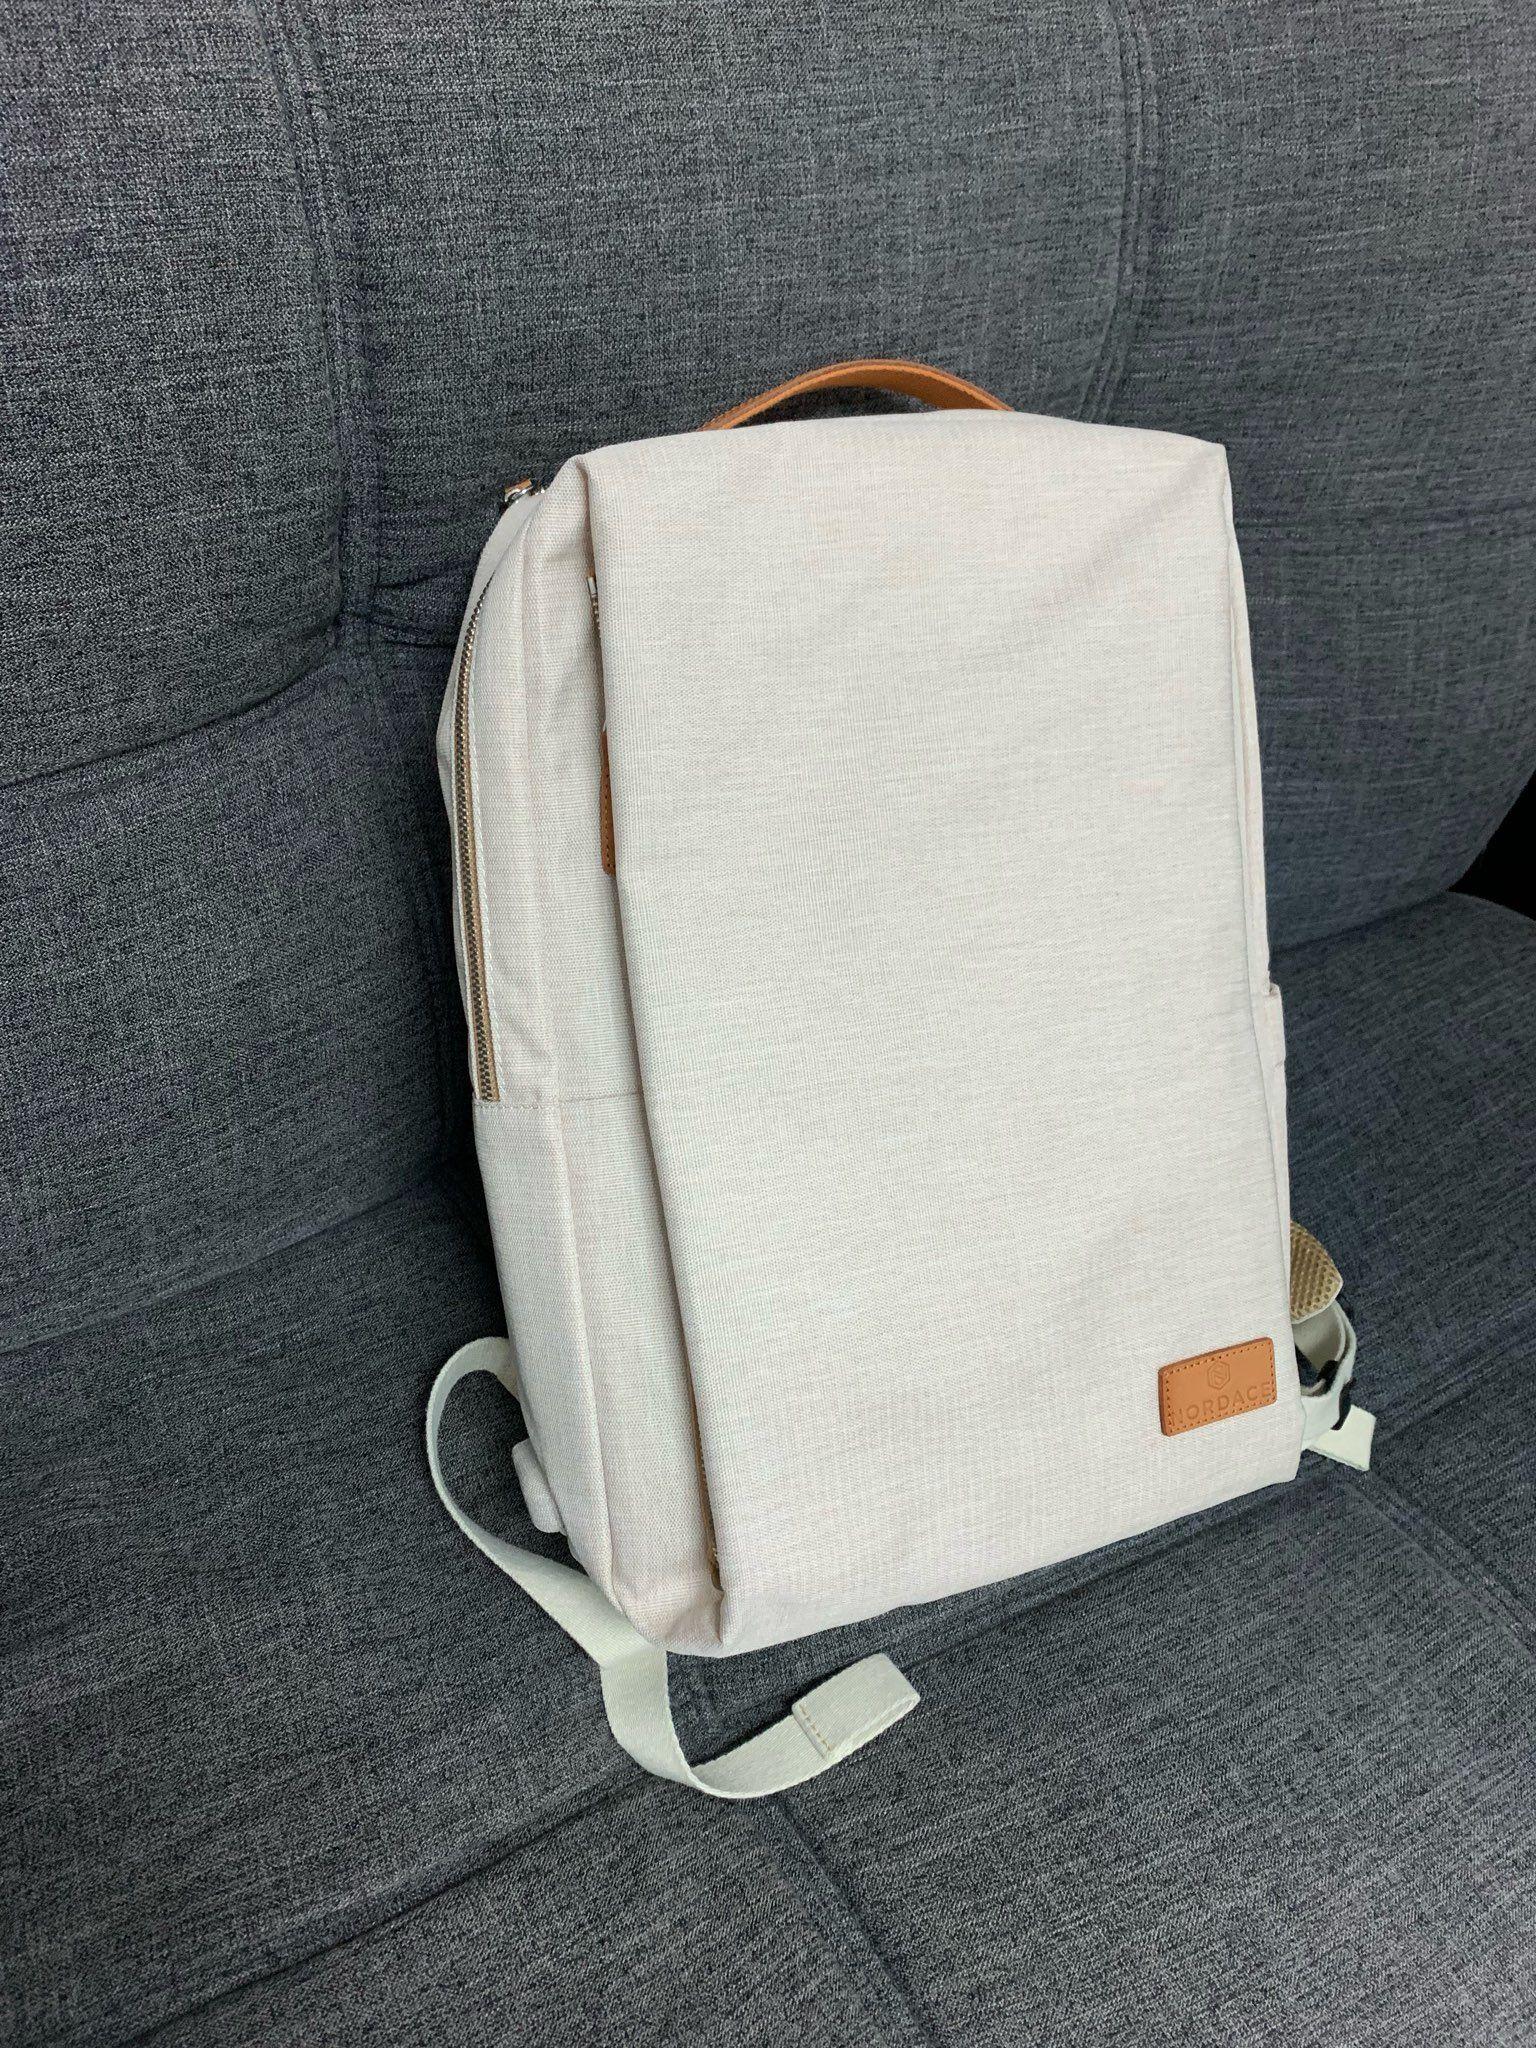 0537d66f1a265d Siena - Smart Backpack in 2019 | Honeymoon!! | Backpacks, Luggage ...